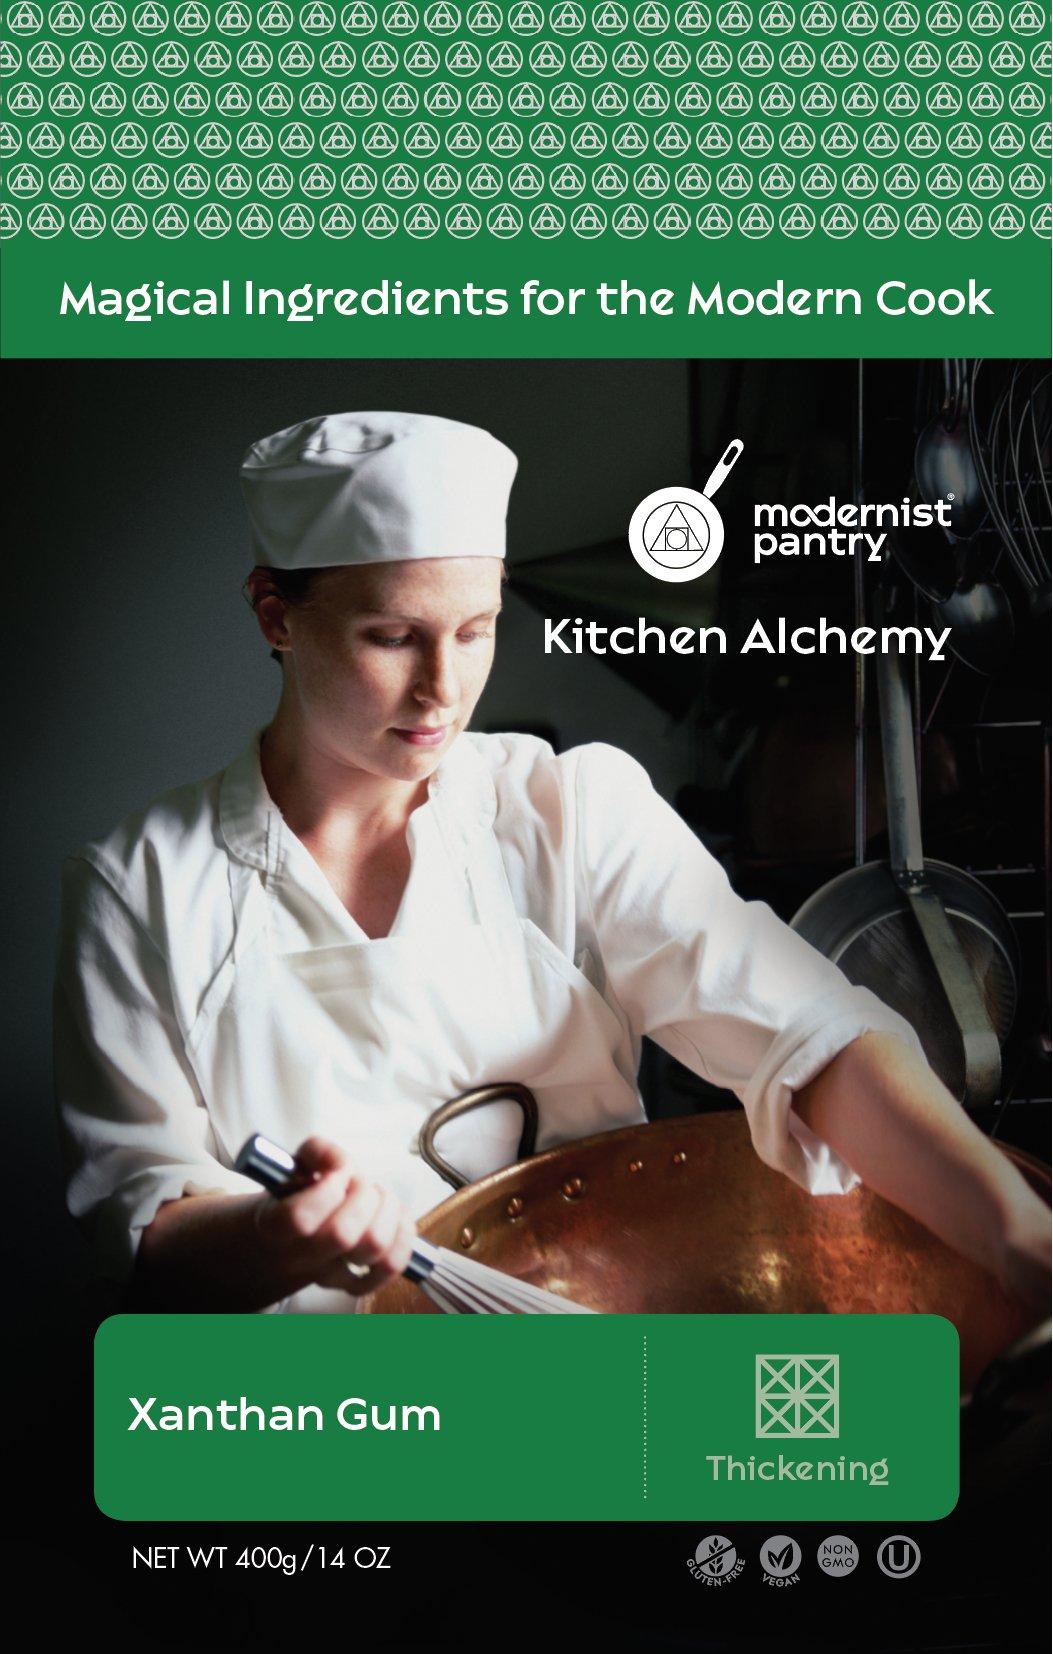 Food Grade Xanthan Gum (Molecular Gastronomy) ⊘ Non-GMO ❤ Gluten-Free ☮ Vegan ✡ OU Kosher Certified - 400g/14oz